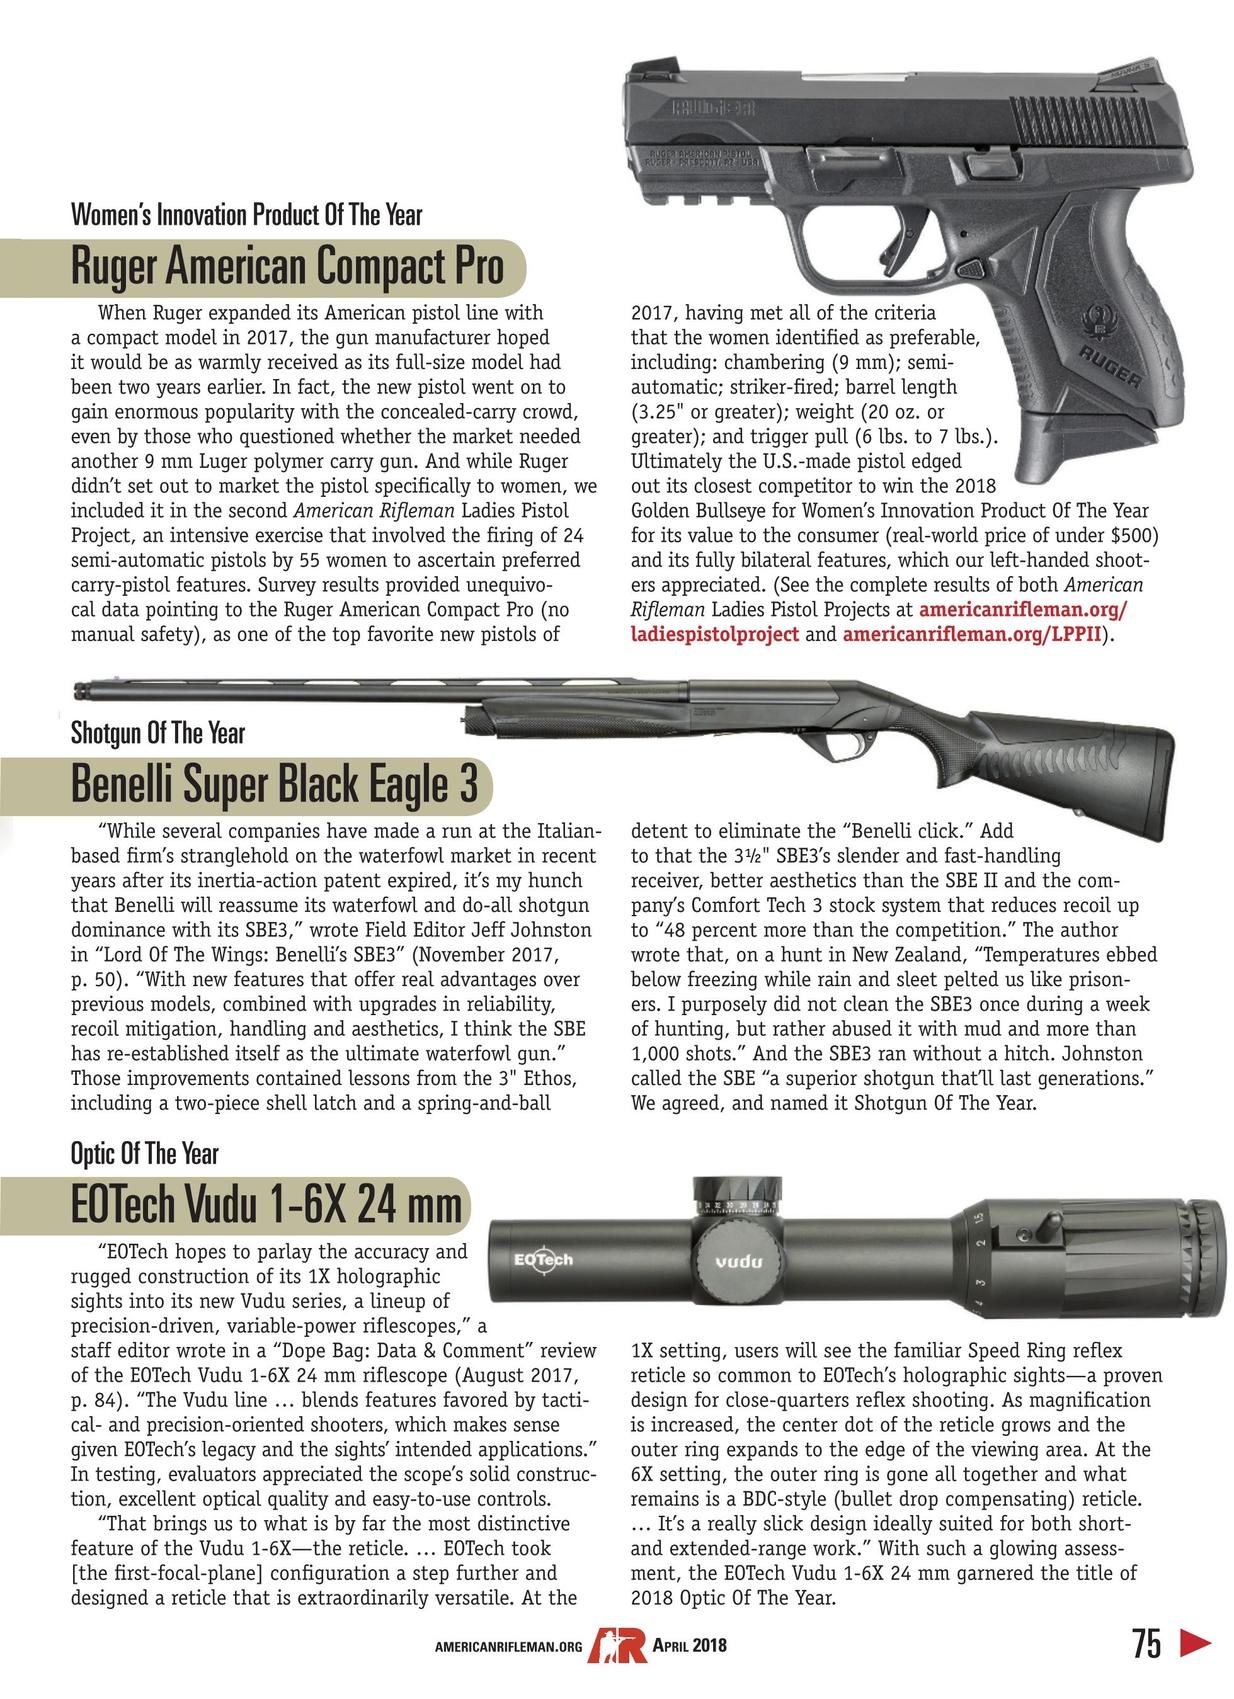 American Rifleman - April 2018